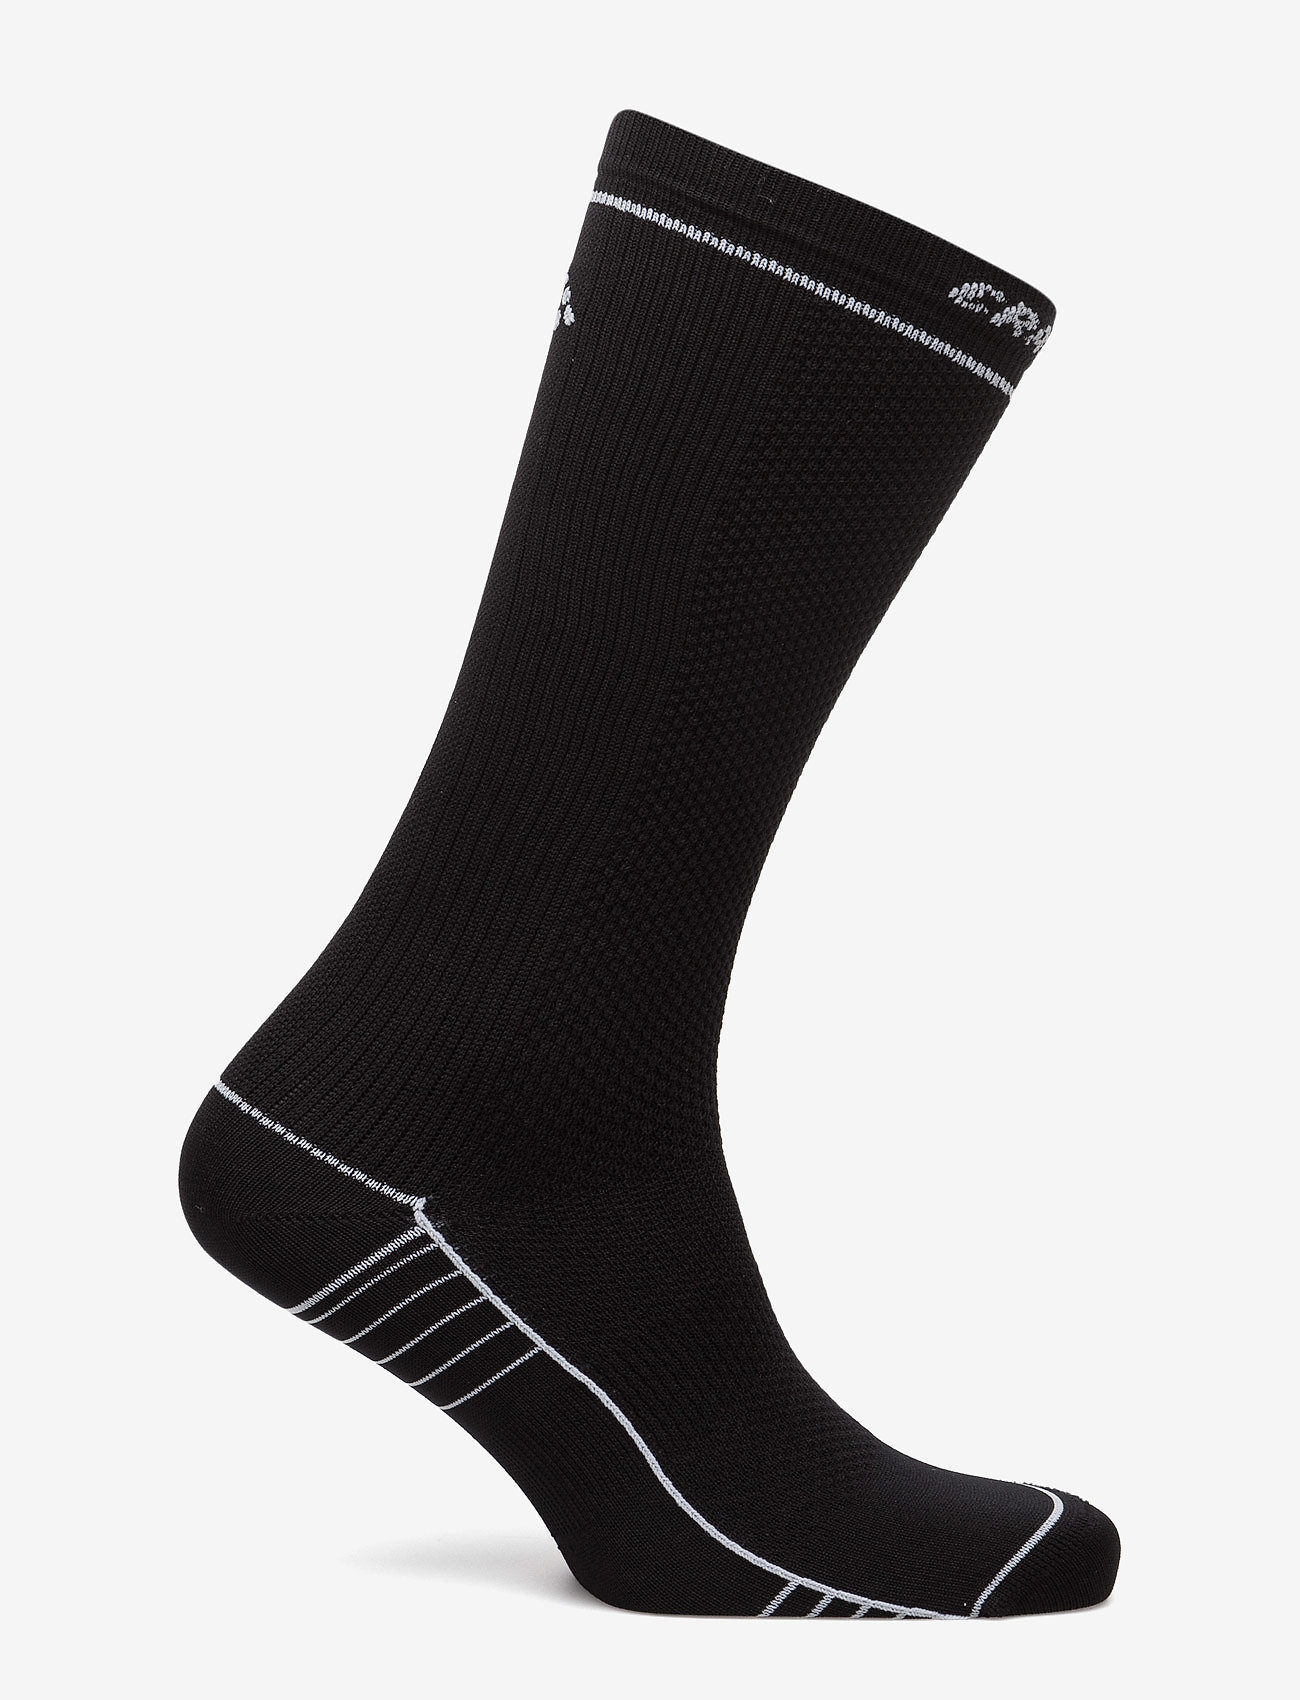 Craft - CRAFT COMPRESSION SOCK DEEP XS/37 - sockor - black - 1